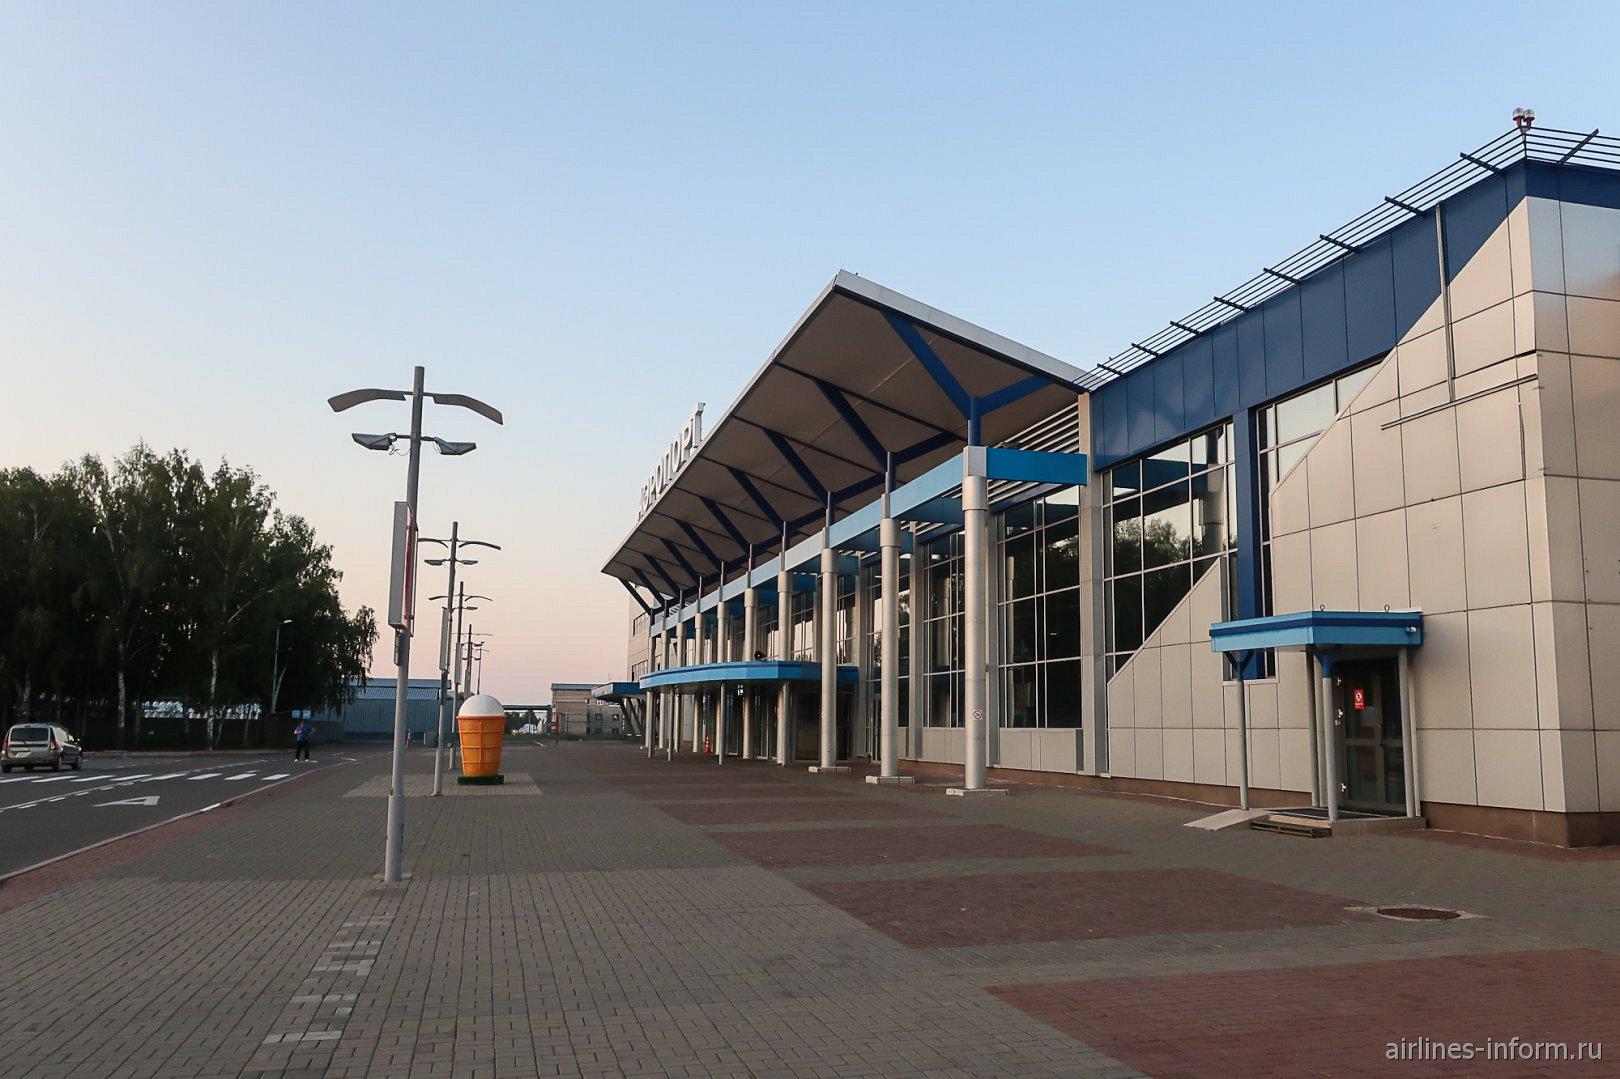 Вход в аэровокзал аэропорта Томск